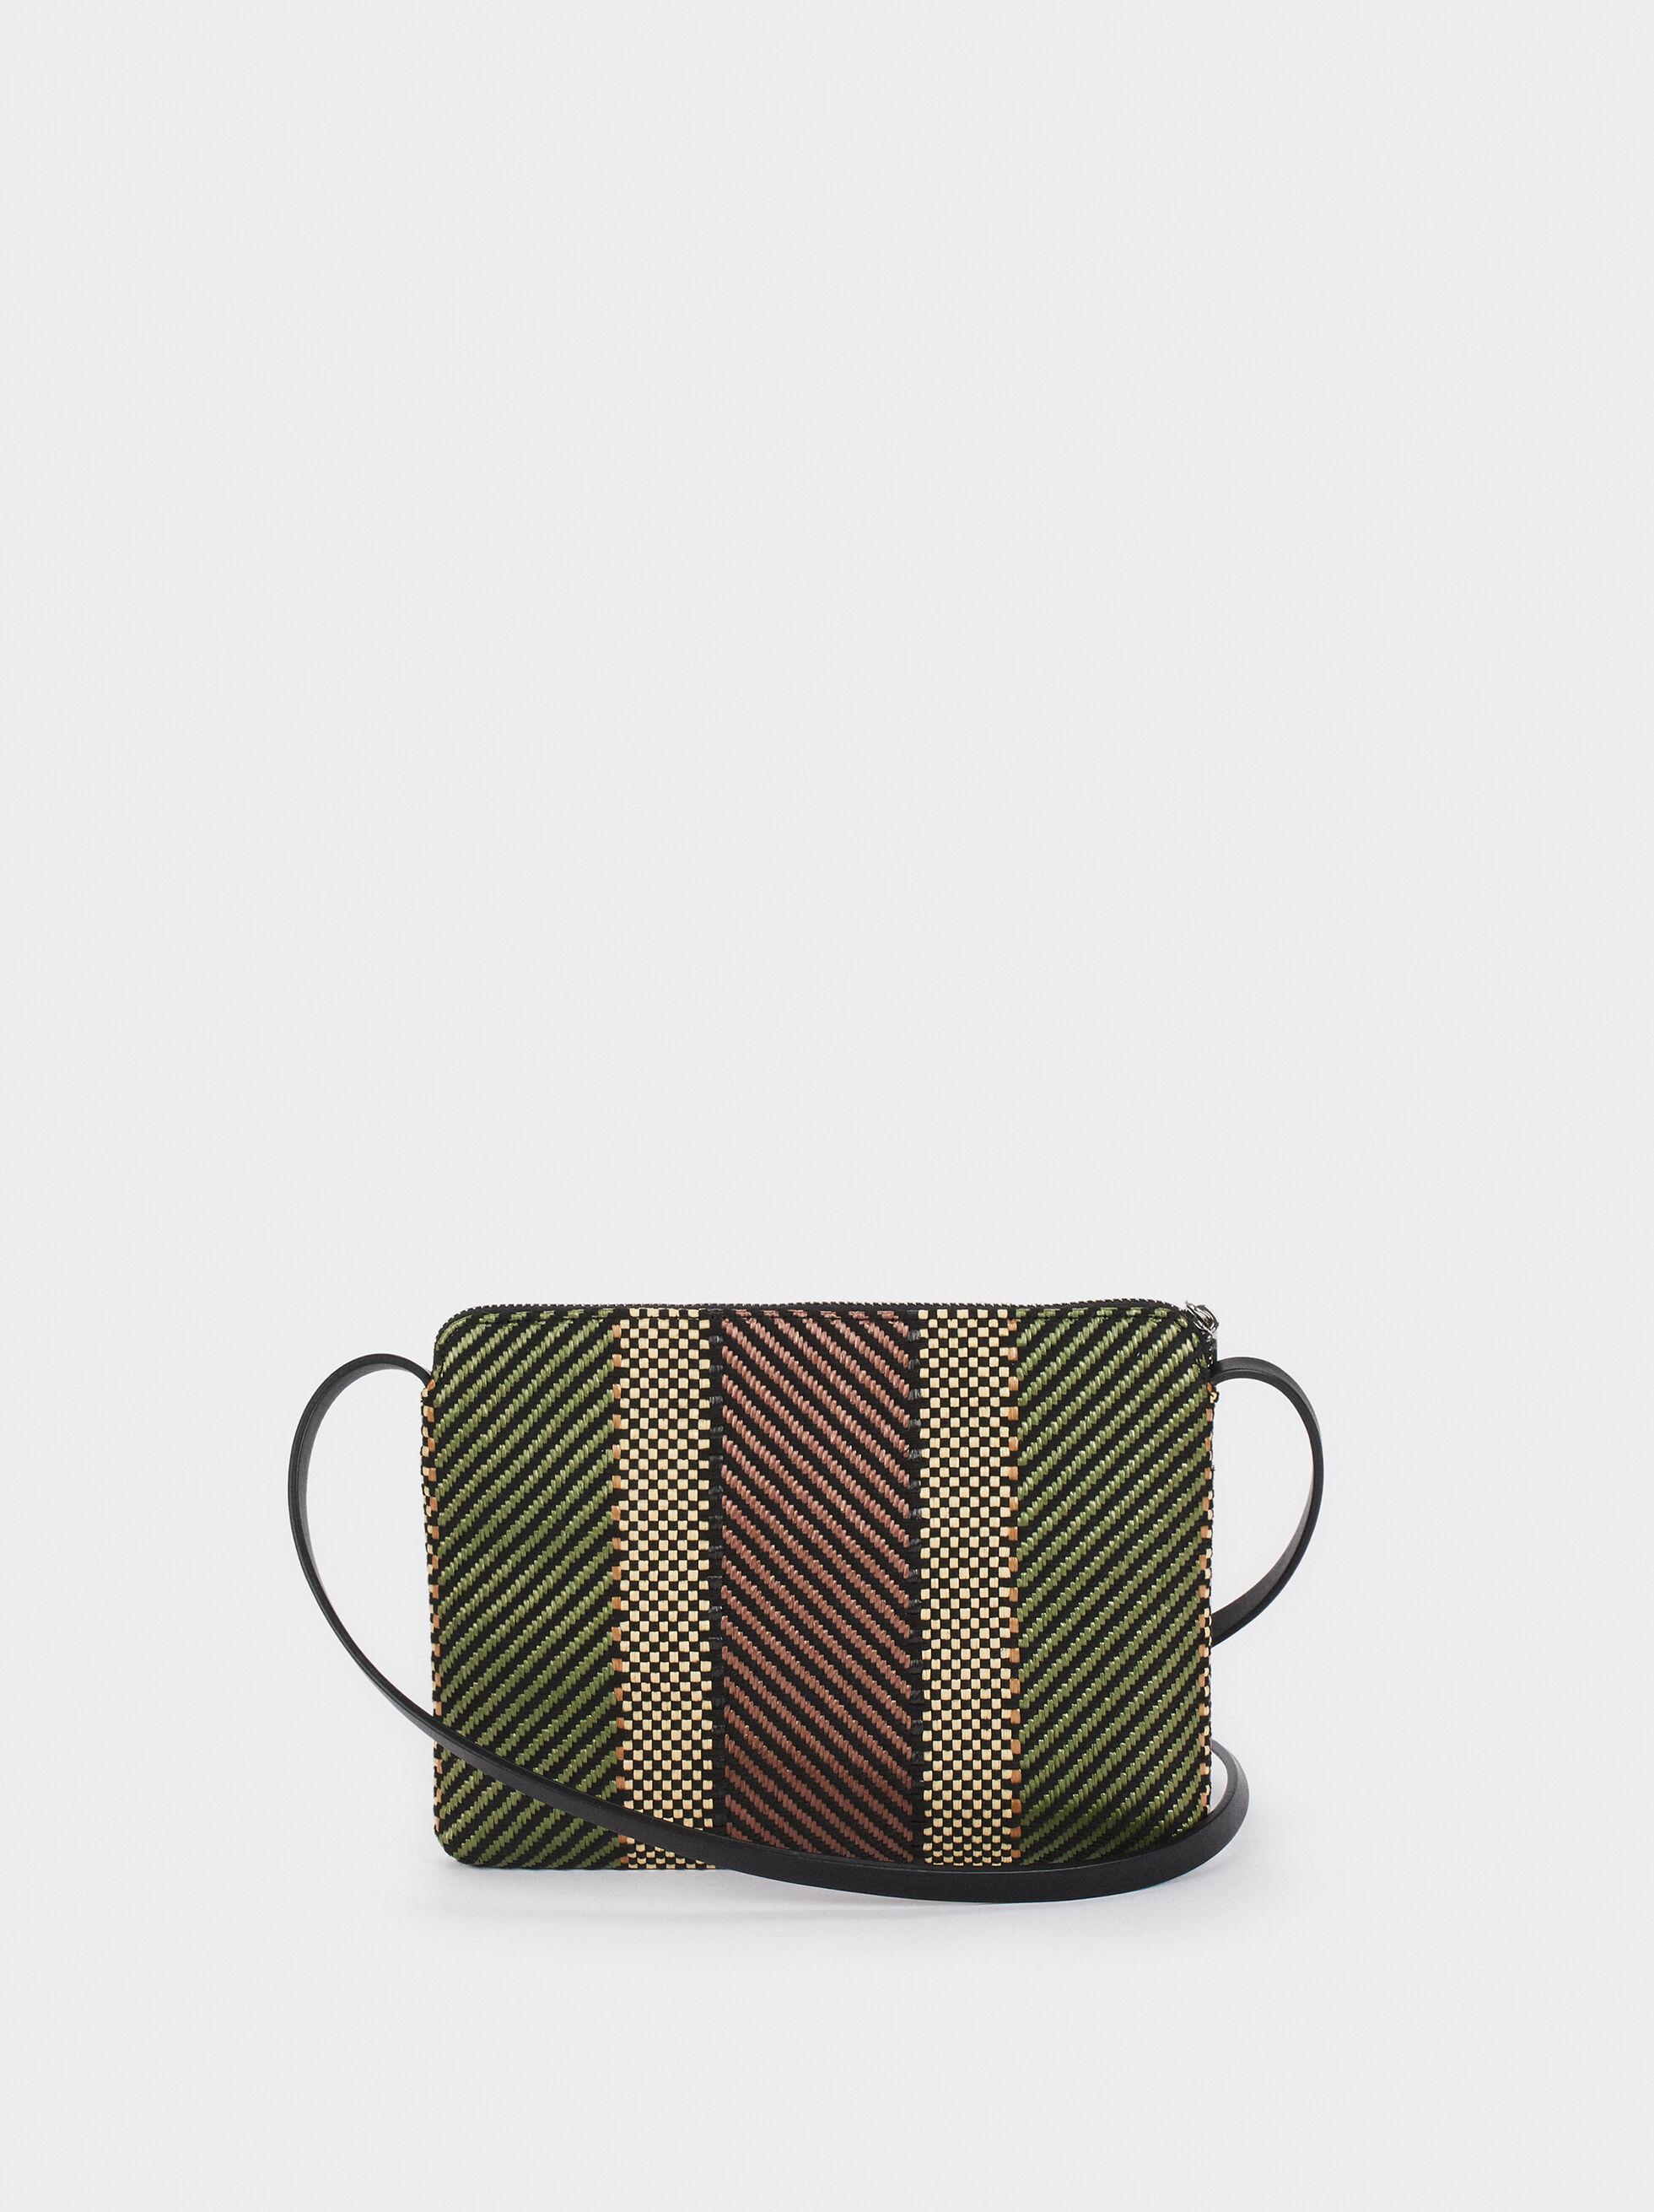 Braided Fabric Crossbody Bag, Khaki, hi-res